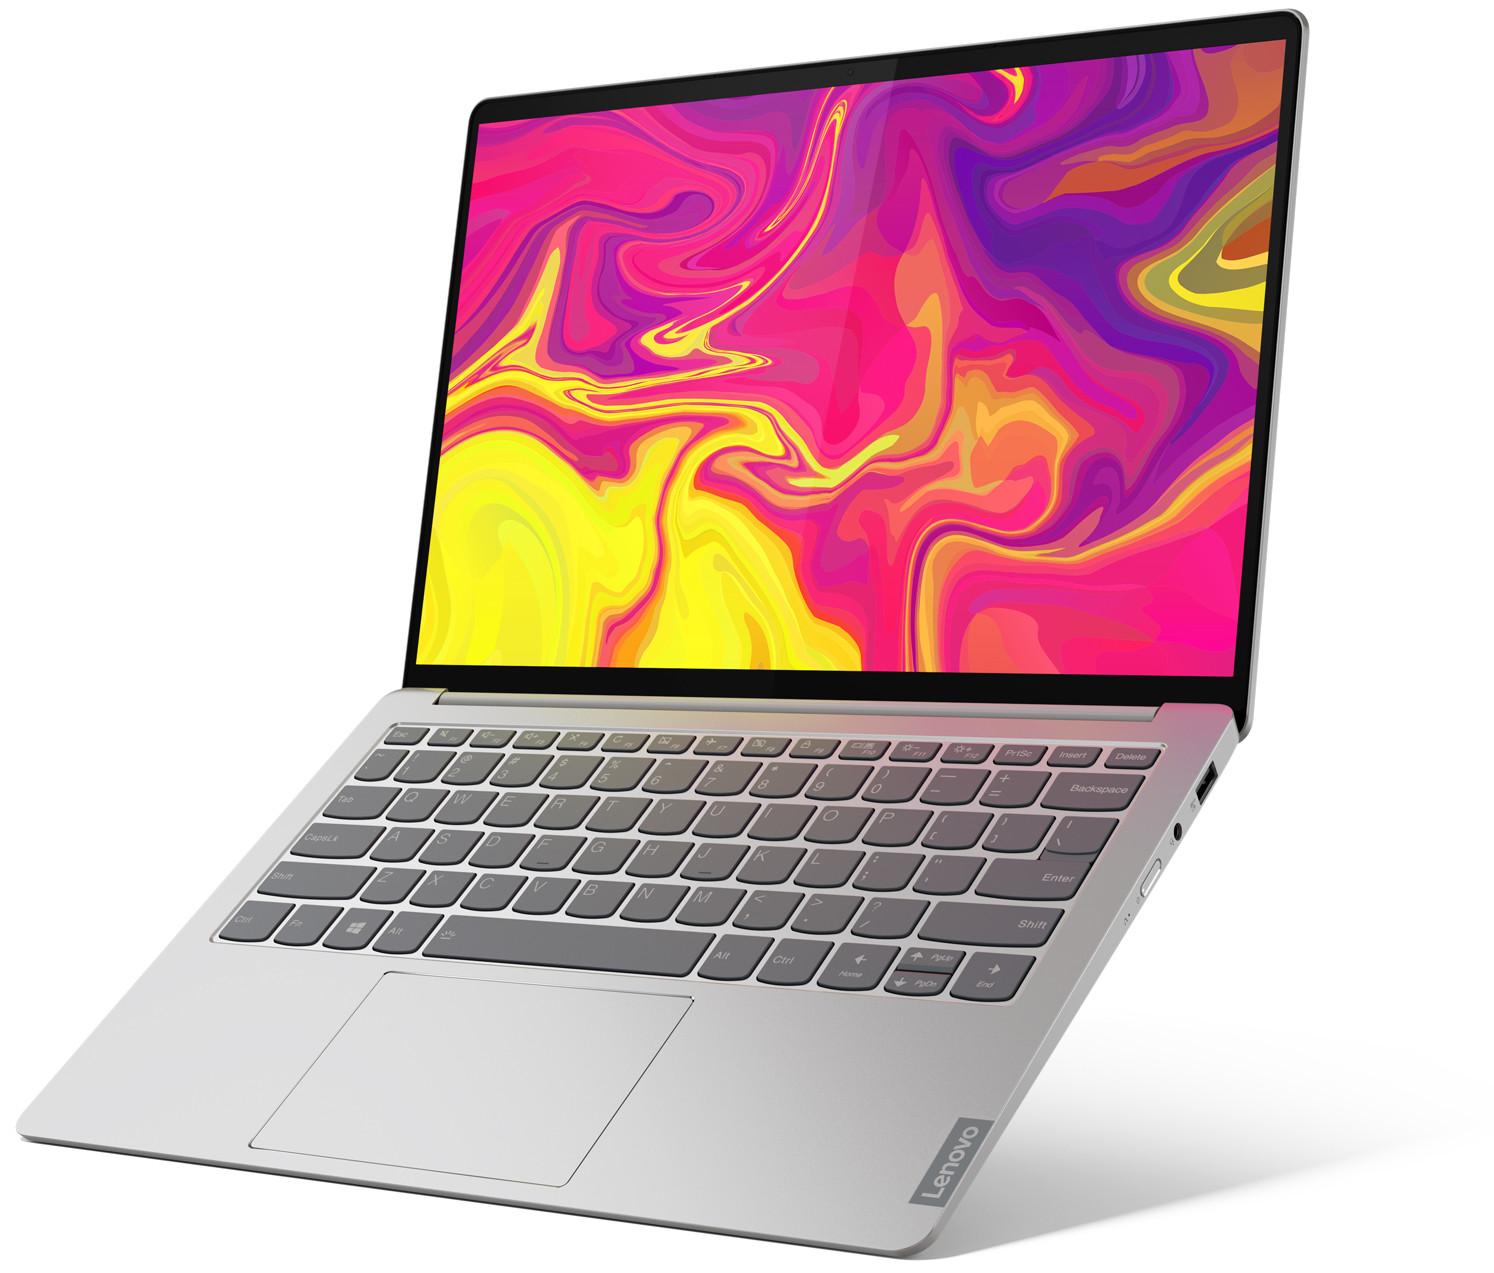 Lenovo IdeaPad S540-13IML - Quad core processor laptop van Lenovo